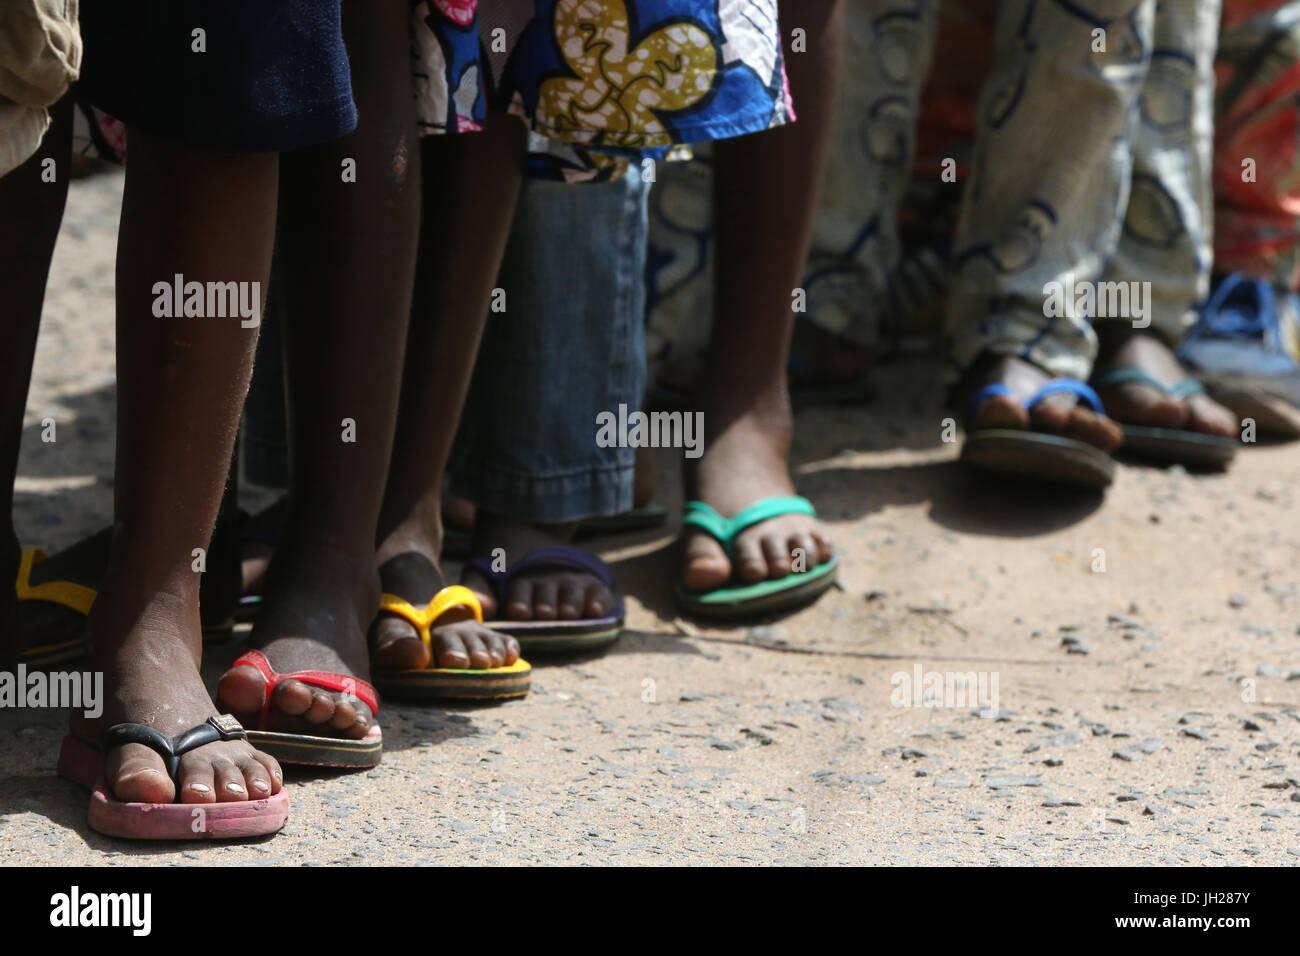 Primary school in Africa. Schoolchildren wearing corlored flip-flops.   Lome. Togo. Stock Photo